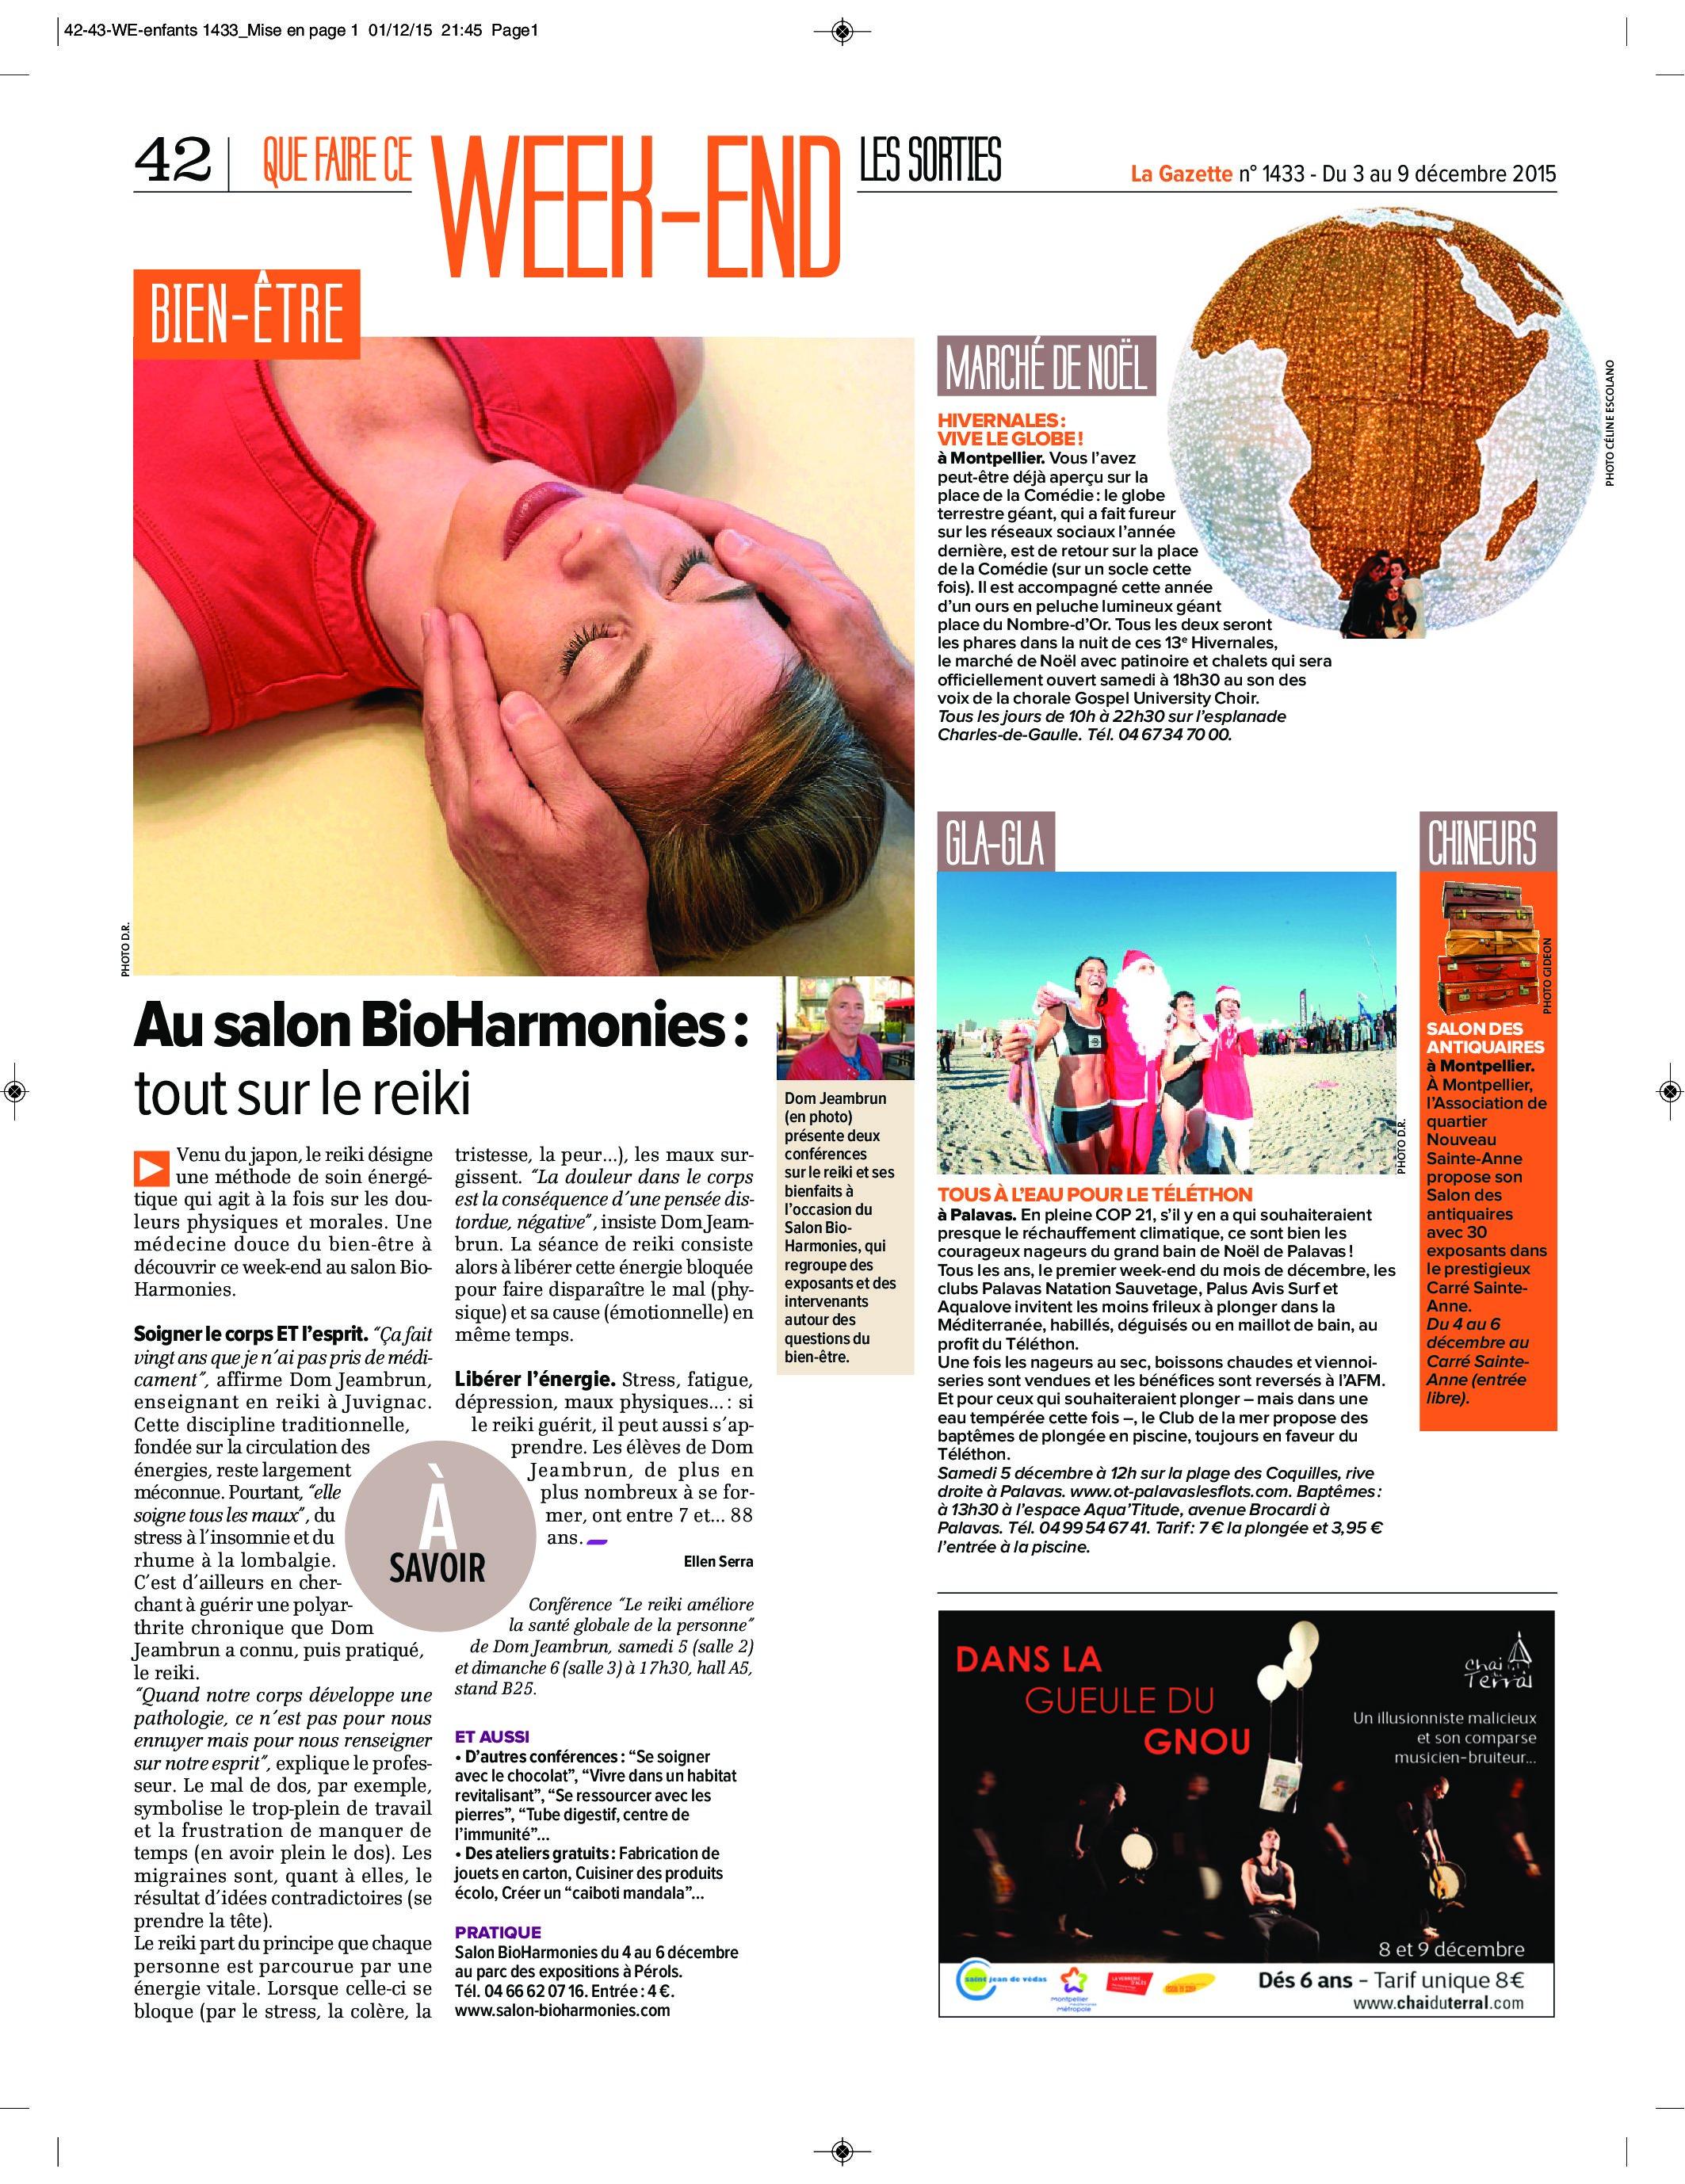 La-Gazette-de-Montpellier-Article-Reiki-Salon-Bio